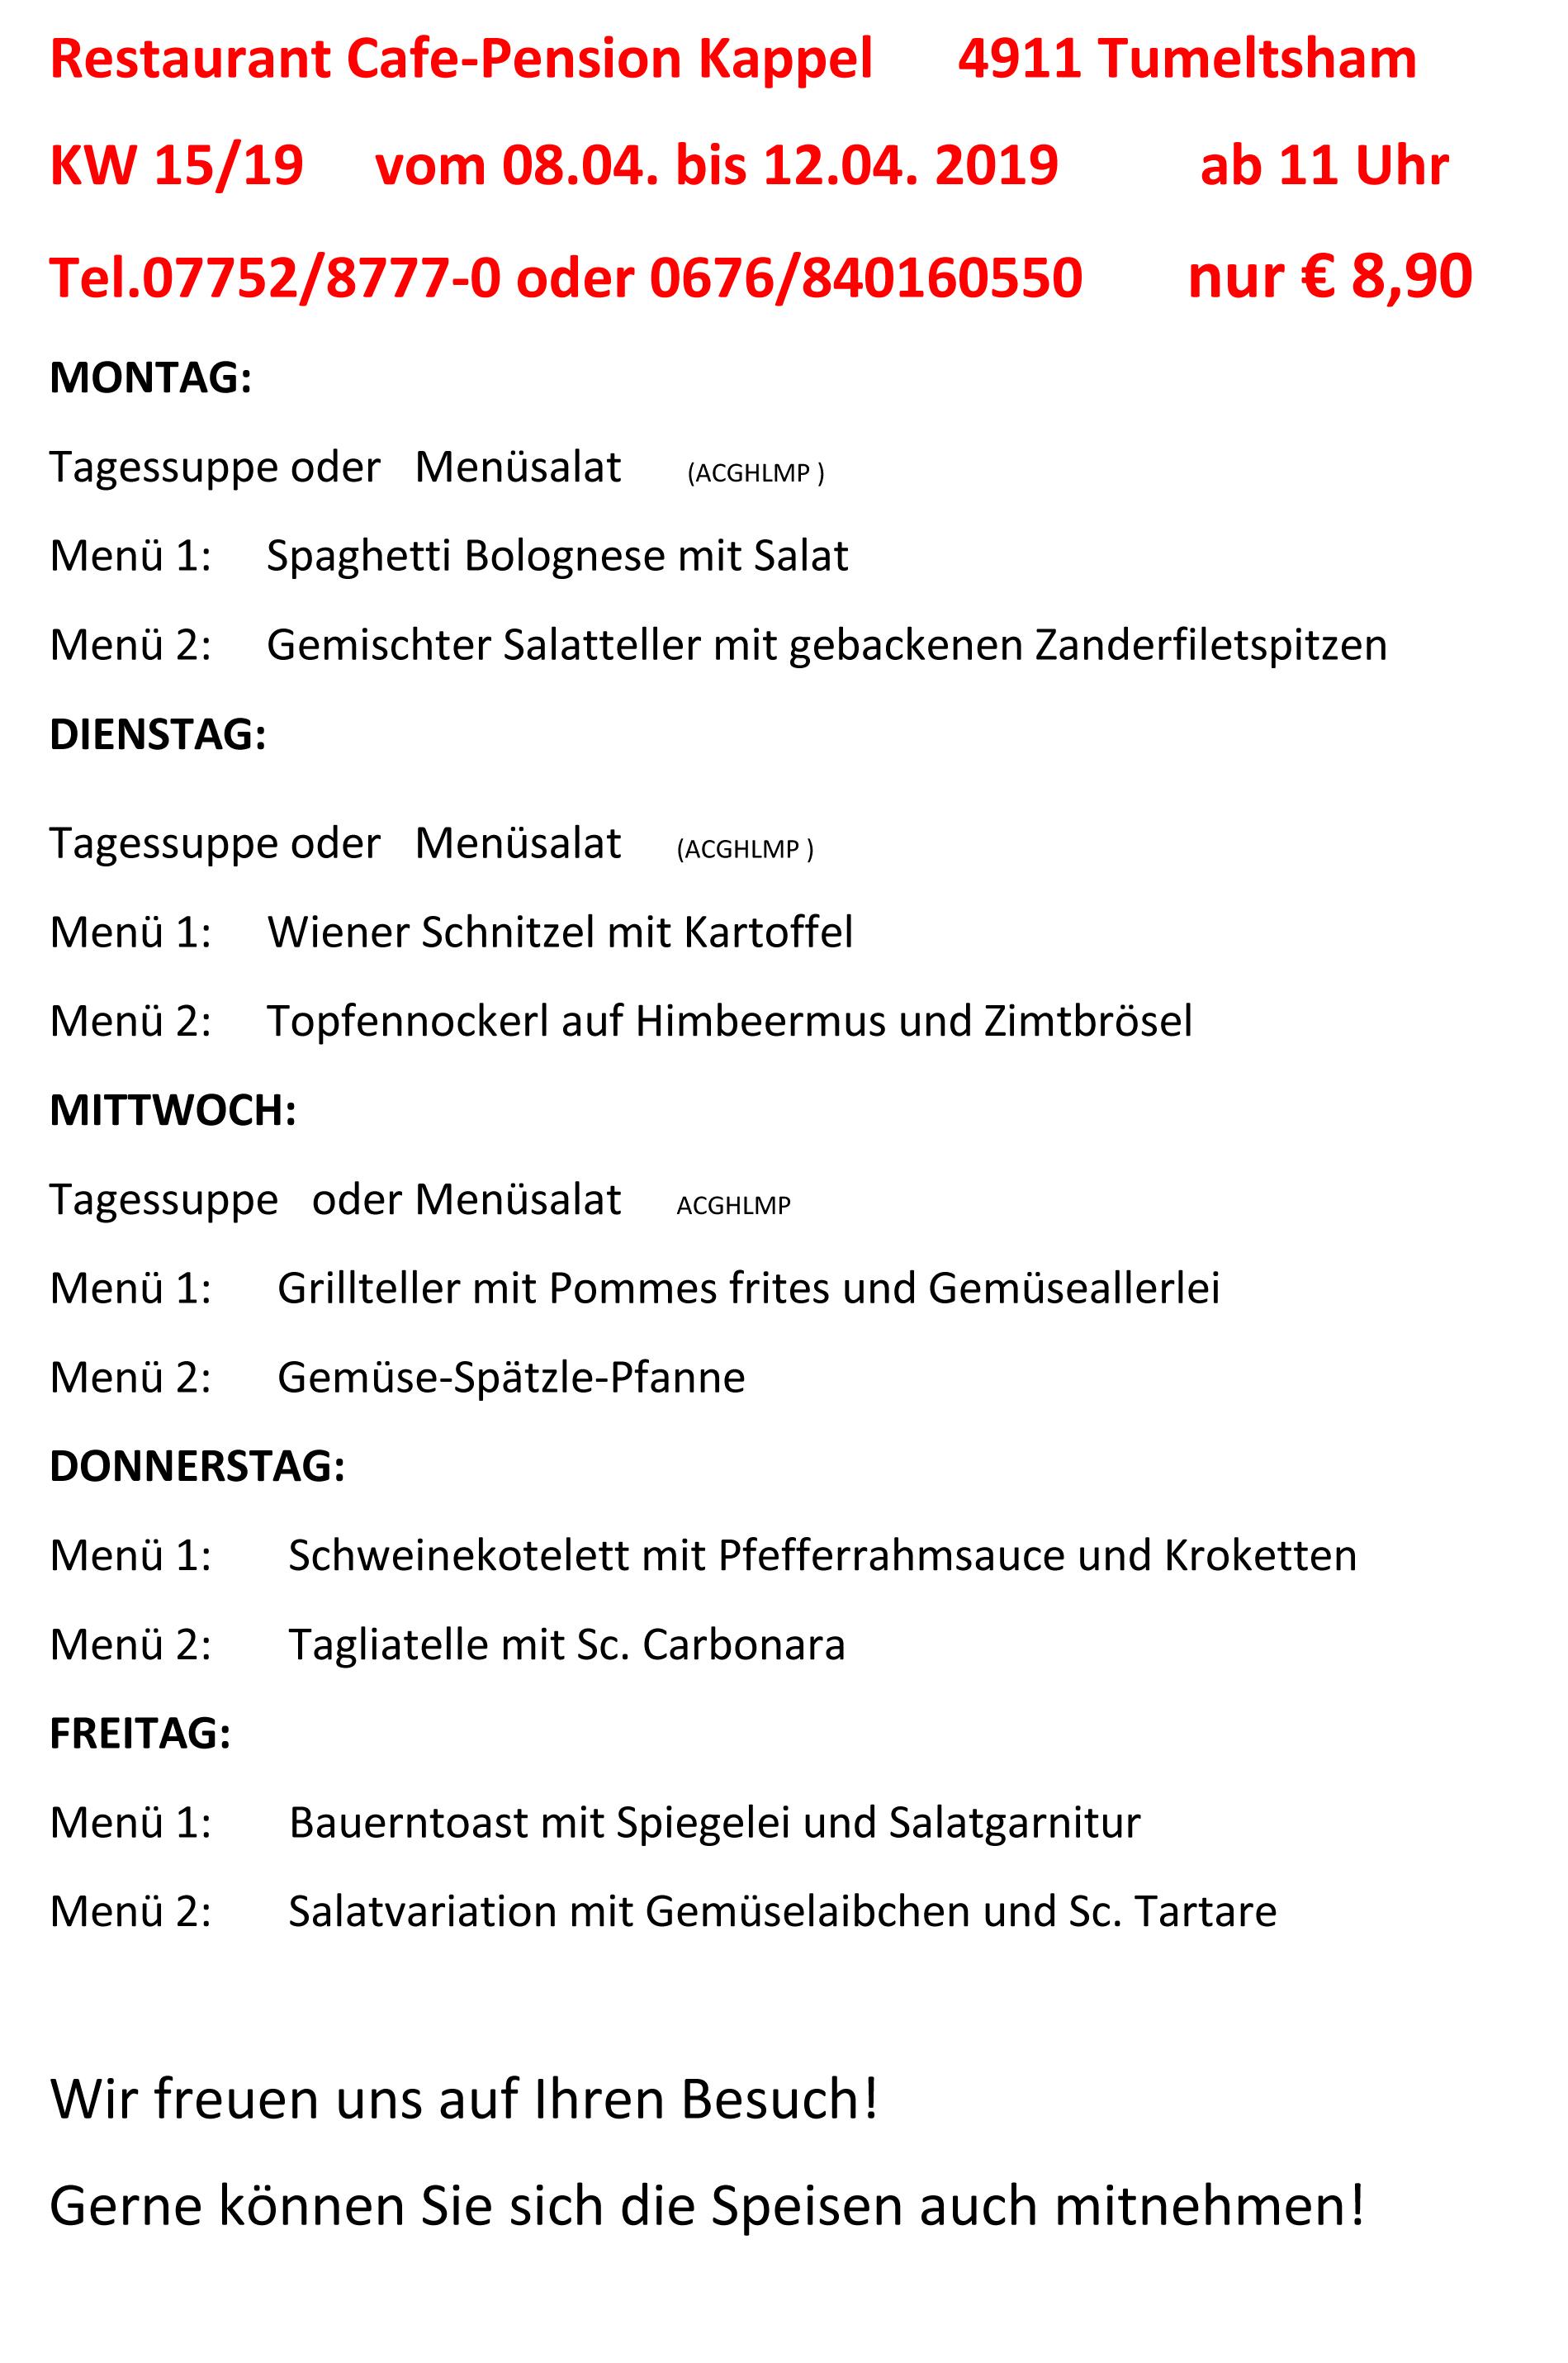 Menüplan KW 15-19docx (1)